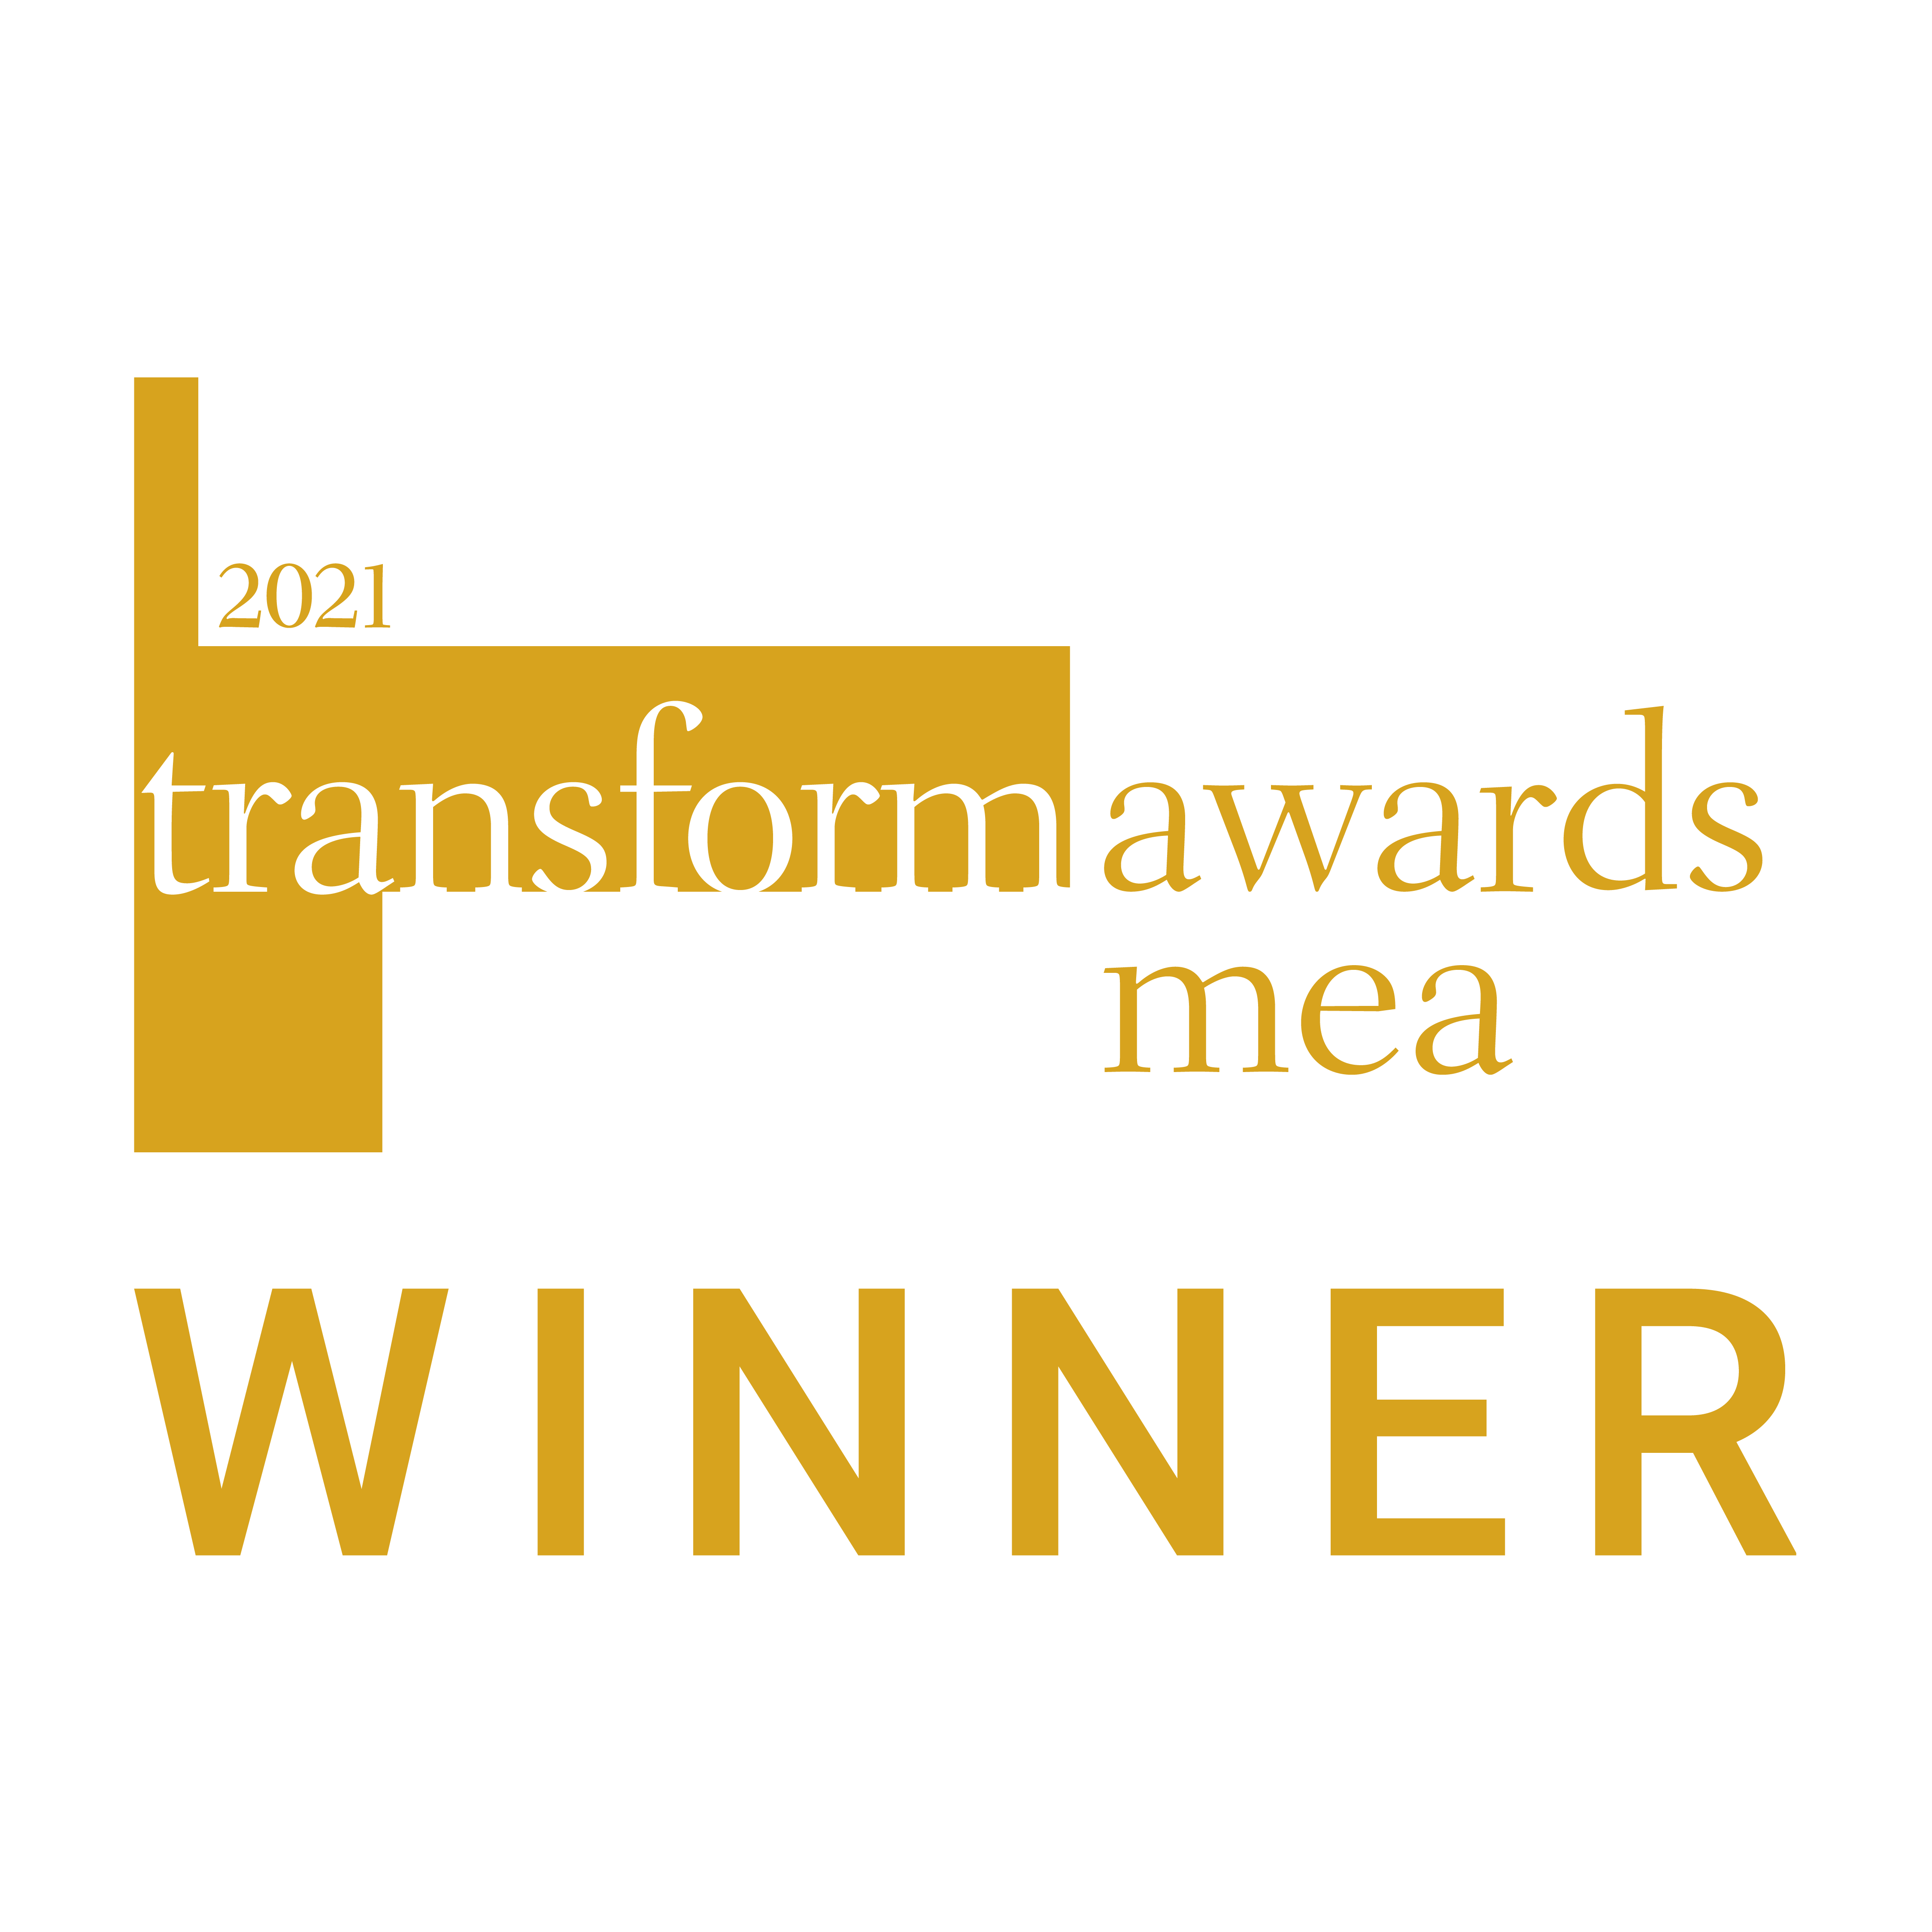 Transform awards mea winner